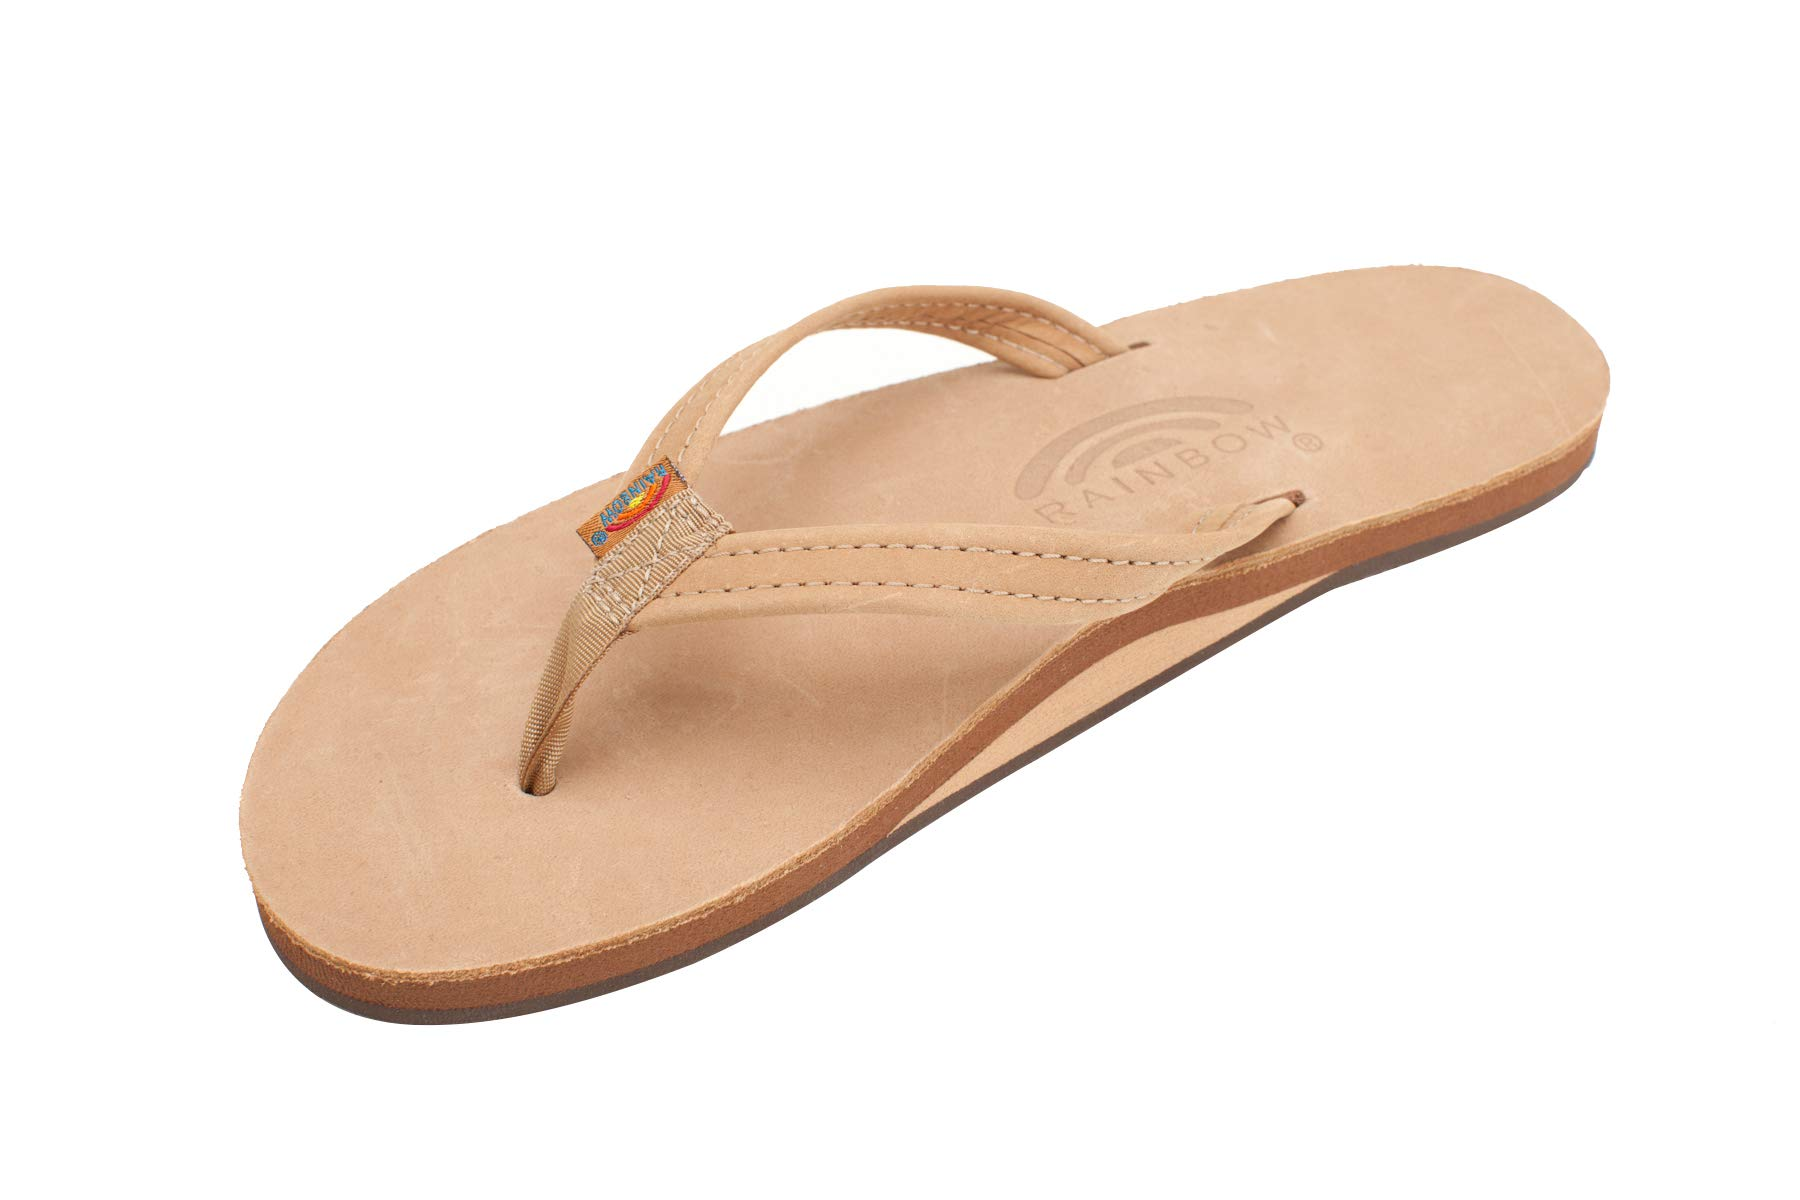 Rainbow Sandals Women's Narrow Strap Womens, Sierra Brown, Large (7.5 - 8.5) by Rainbow Sandals